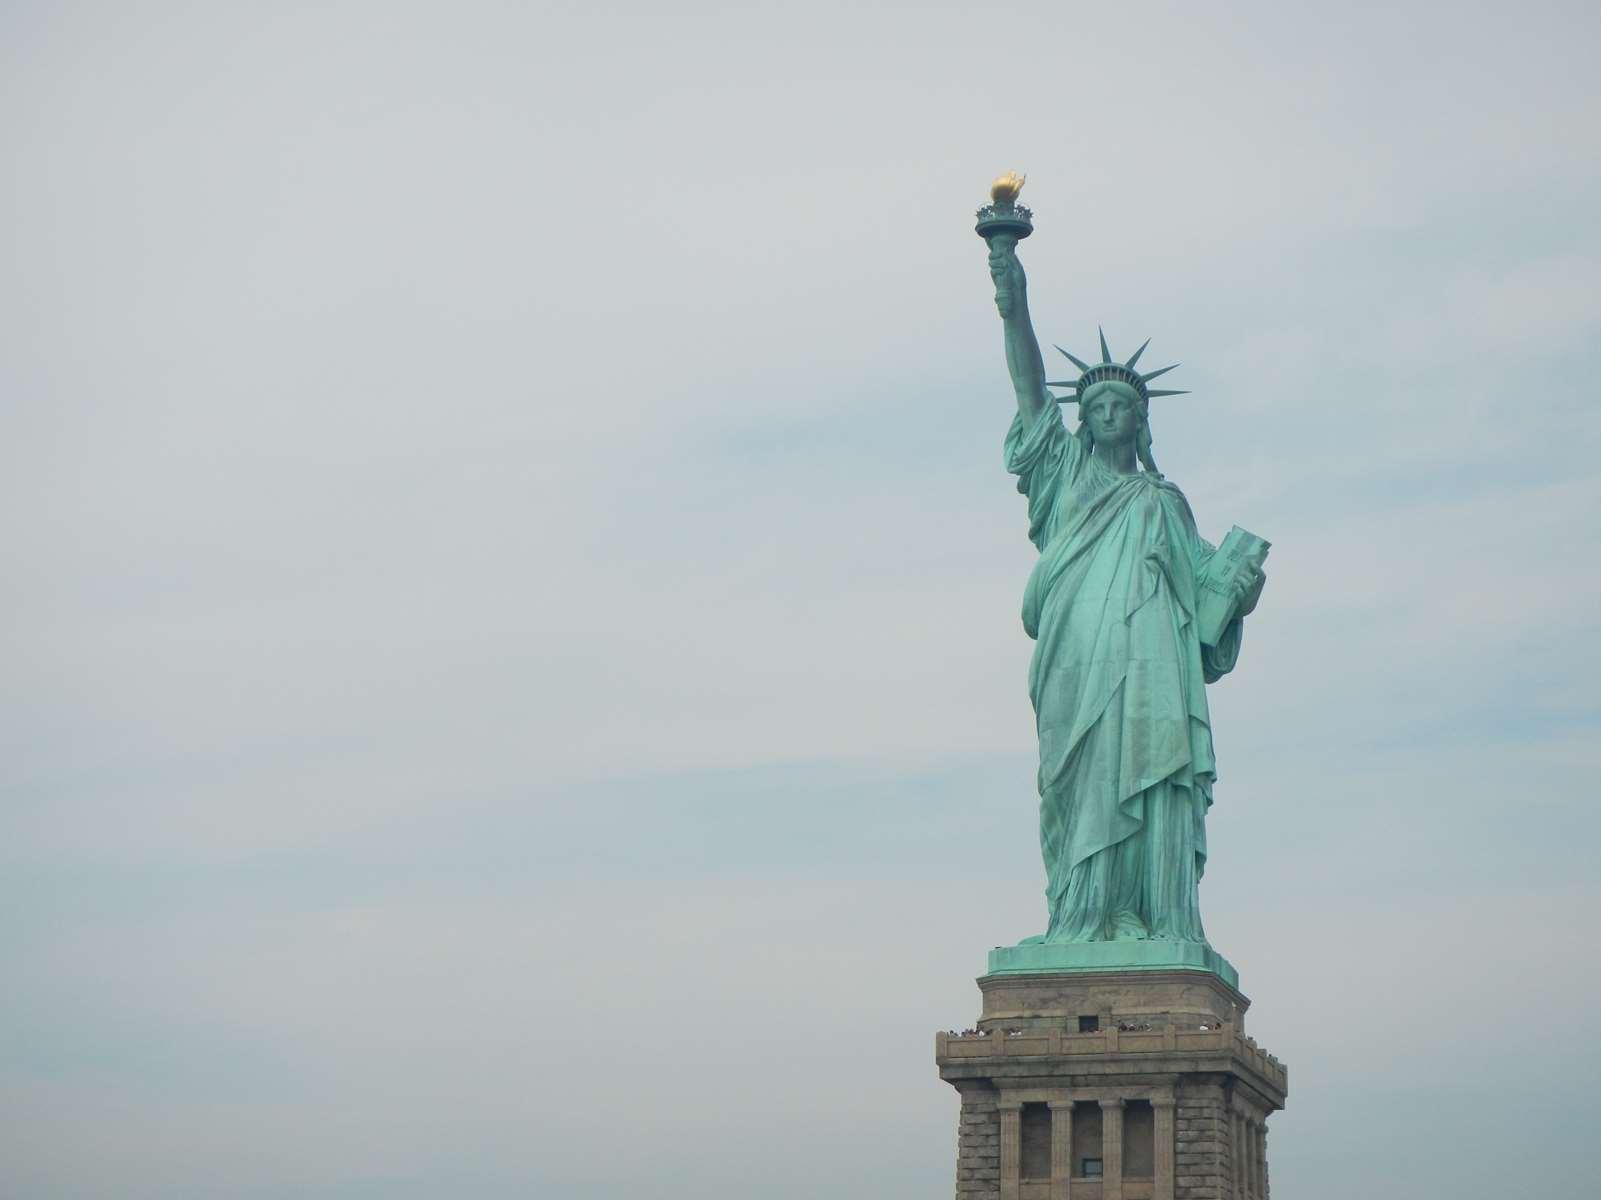 New York - Statue de la liberté - Claironyva